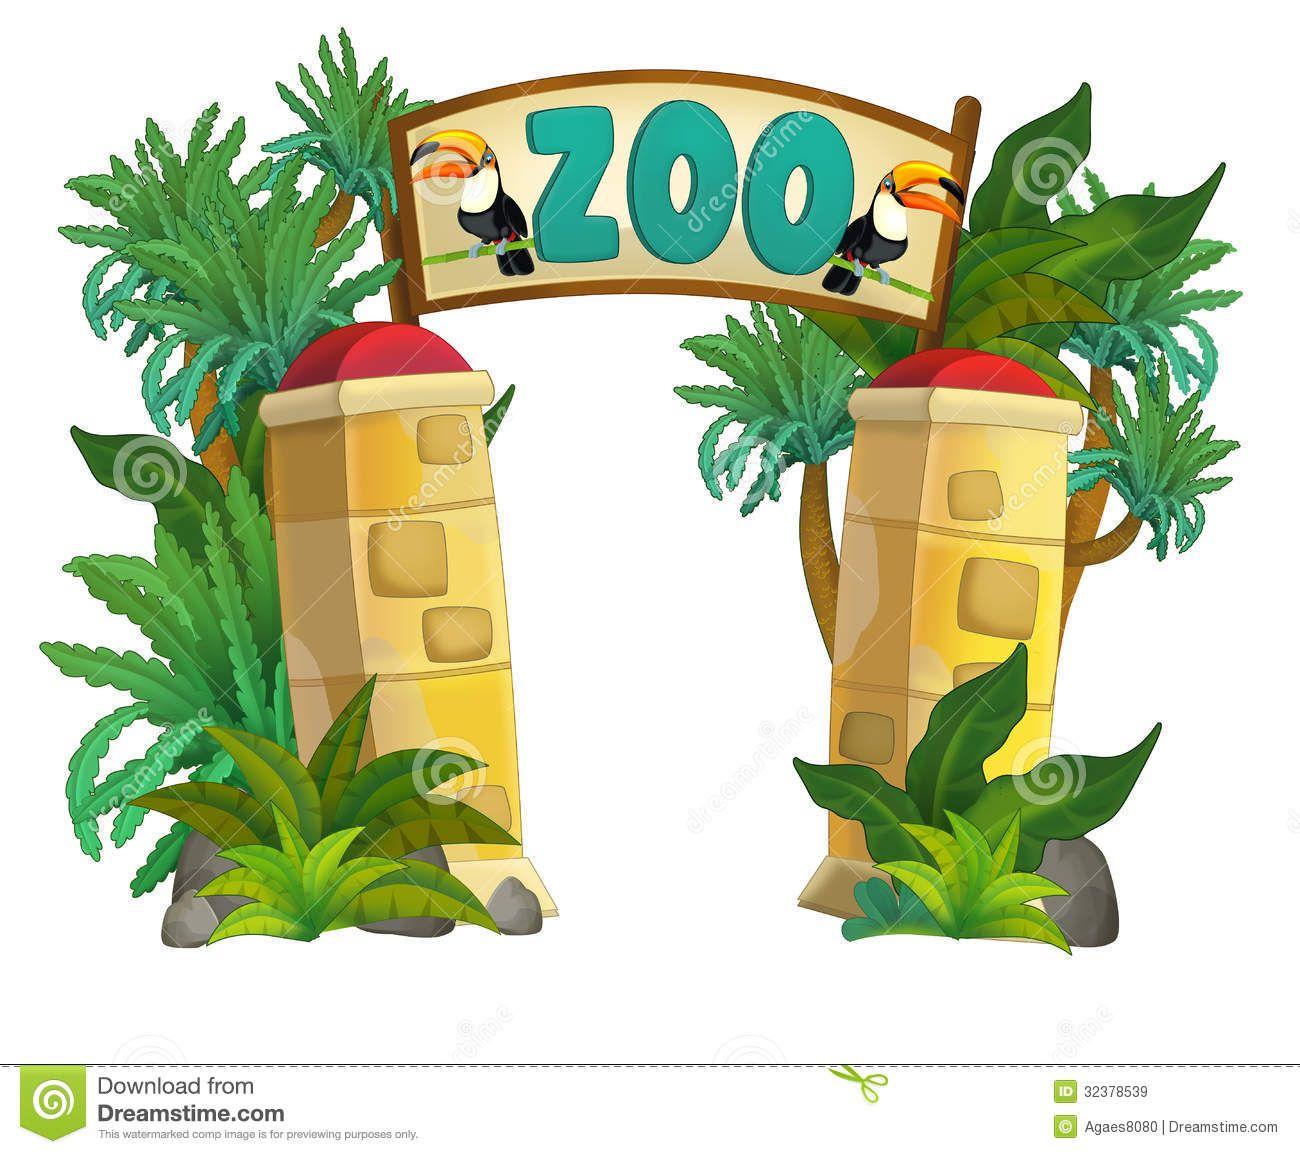 Zoo clipart backdrop image download Cartoon Zoo Background - ClipartFest | Zoo Background ... image download